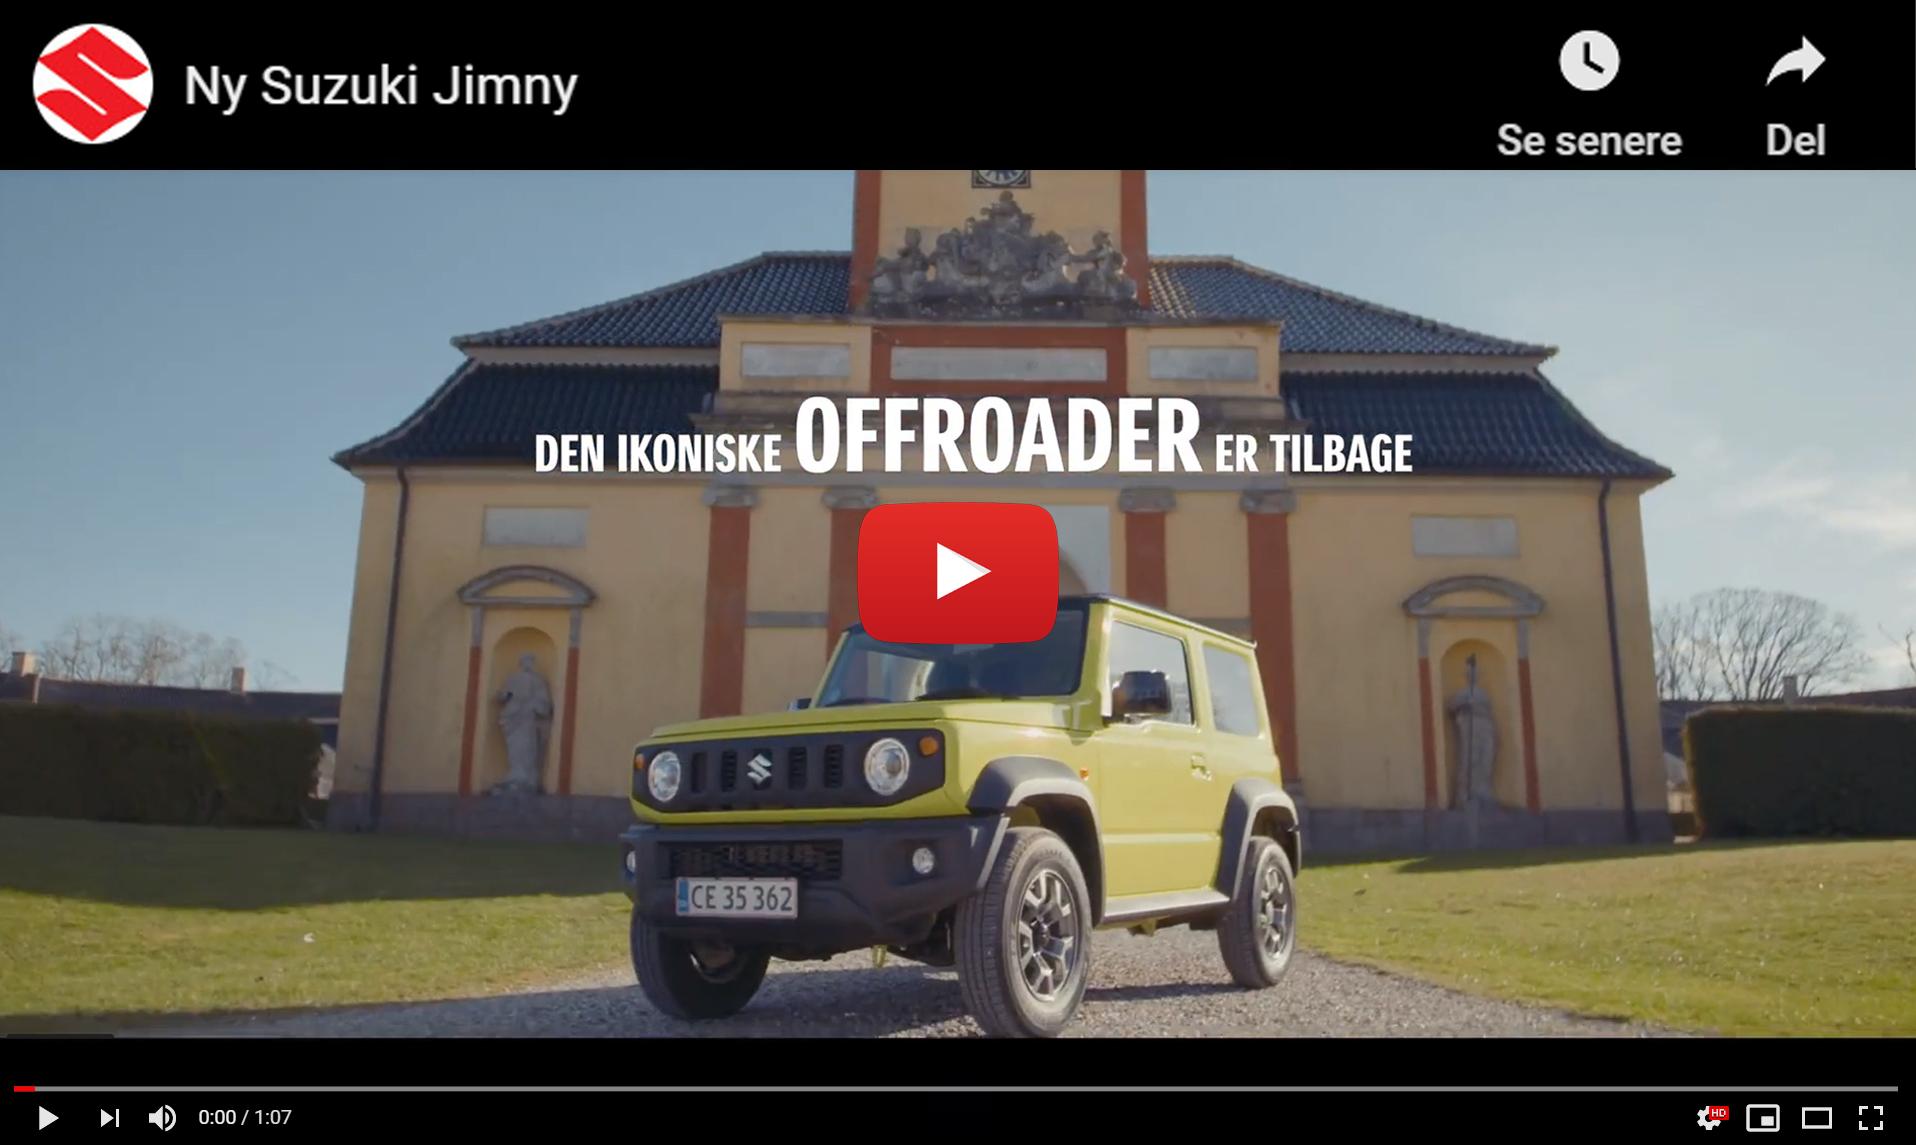 Ny Suzuki Jimny - Oplev en ægte offroader hos Daugaard Biler